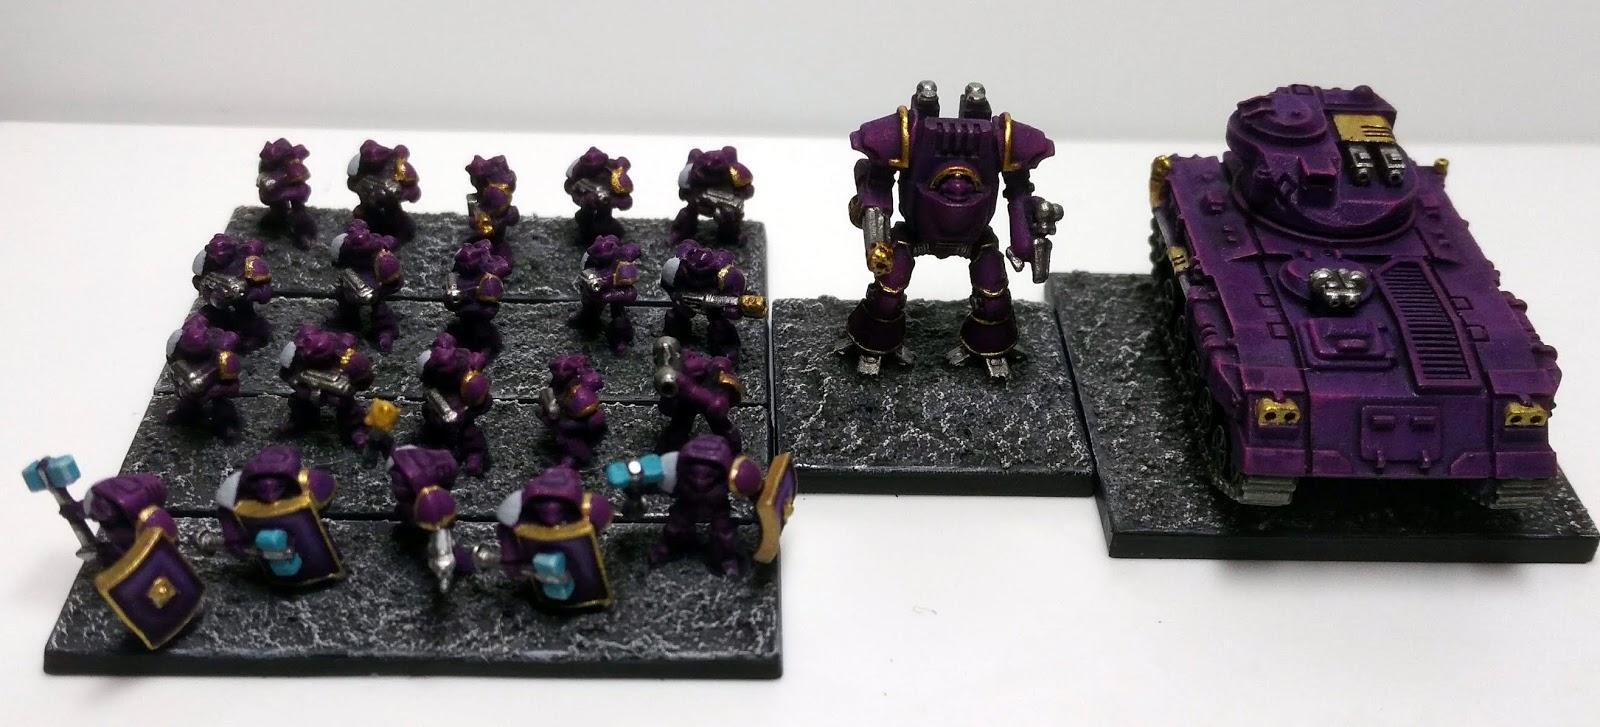 Epic 40k/30k Loyalist Emperors Children (6mm scale sci-fi